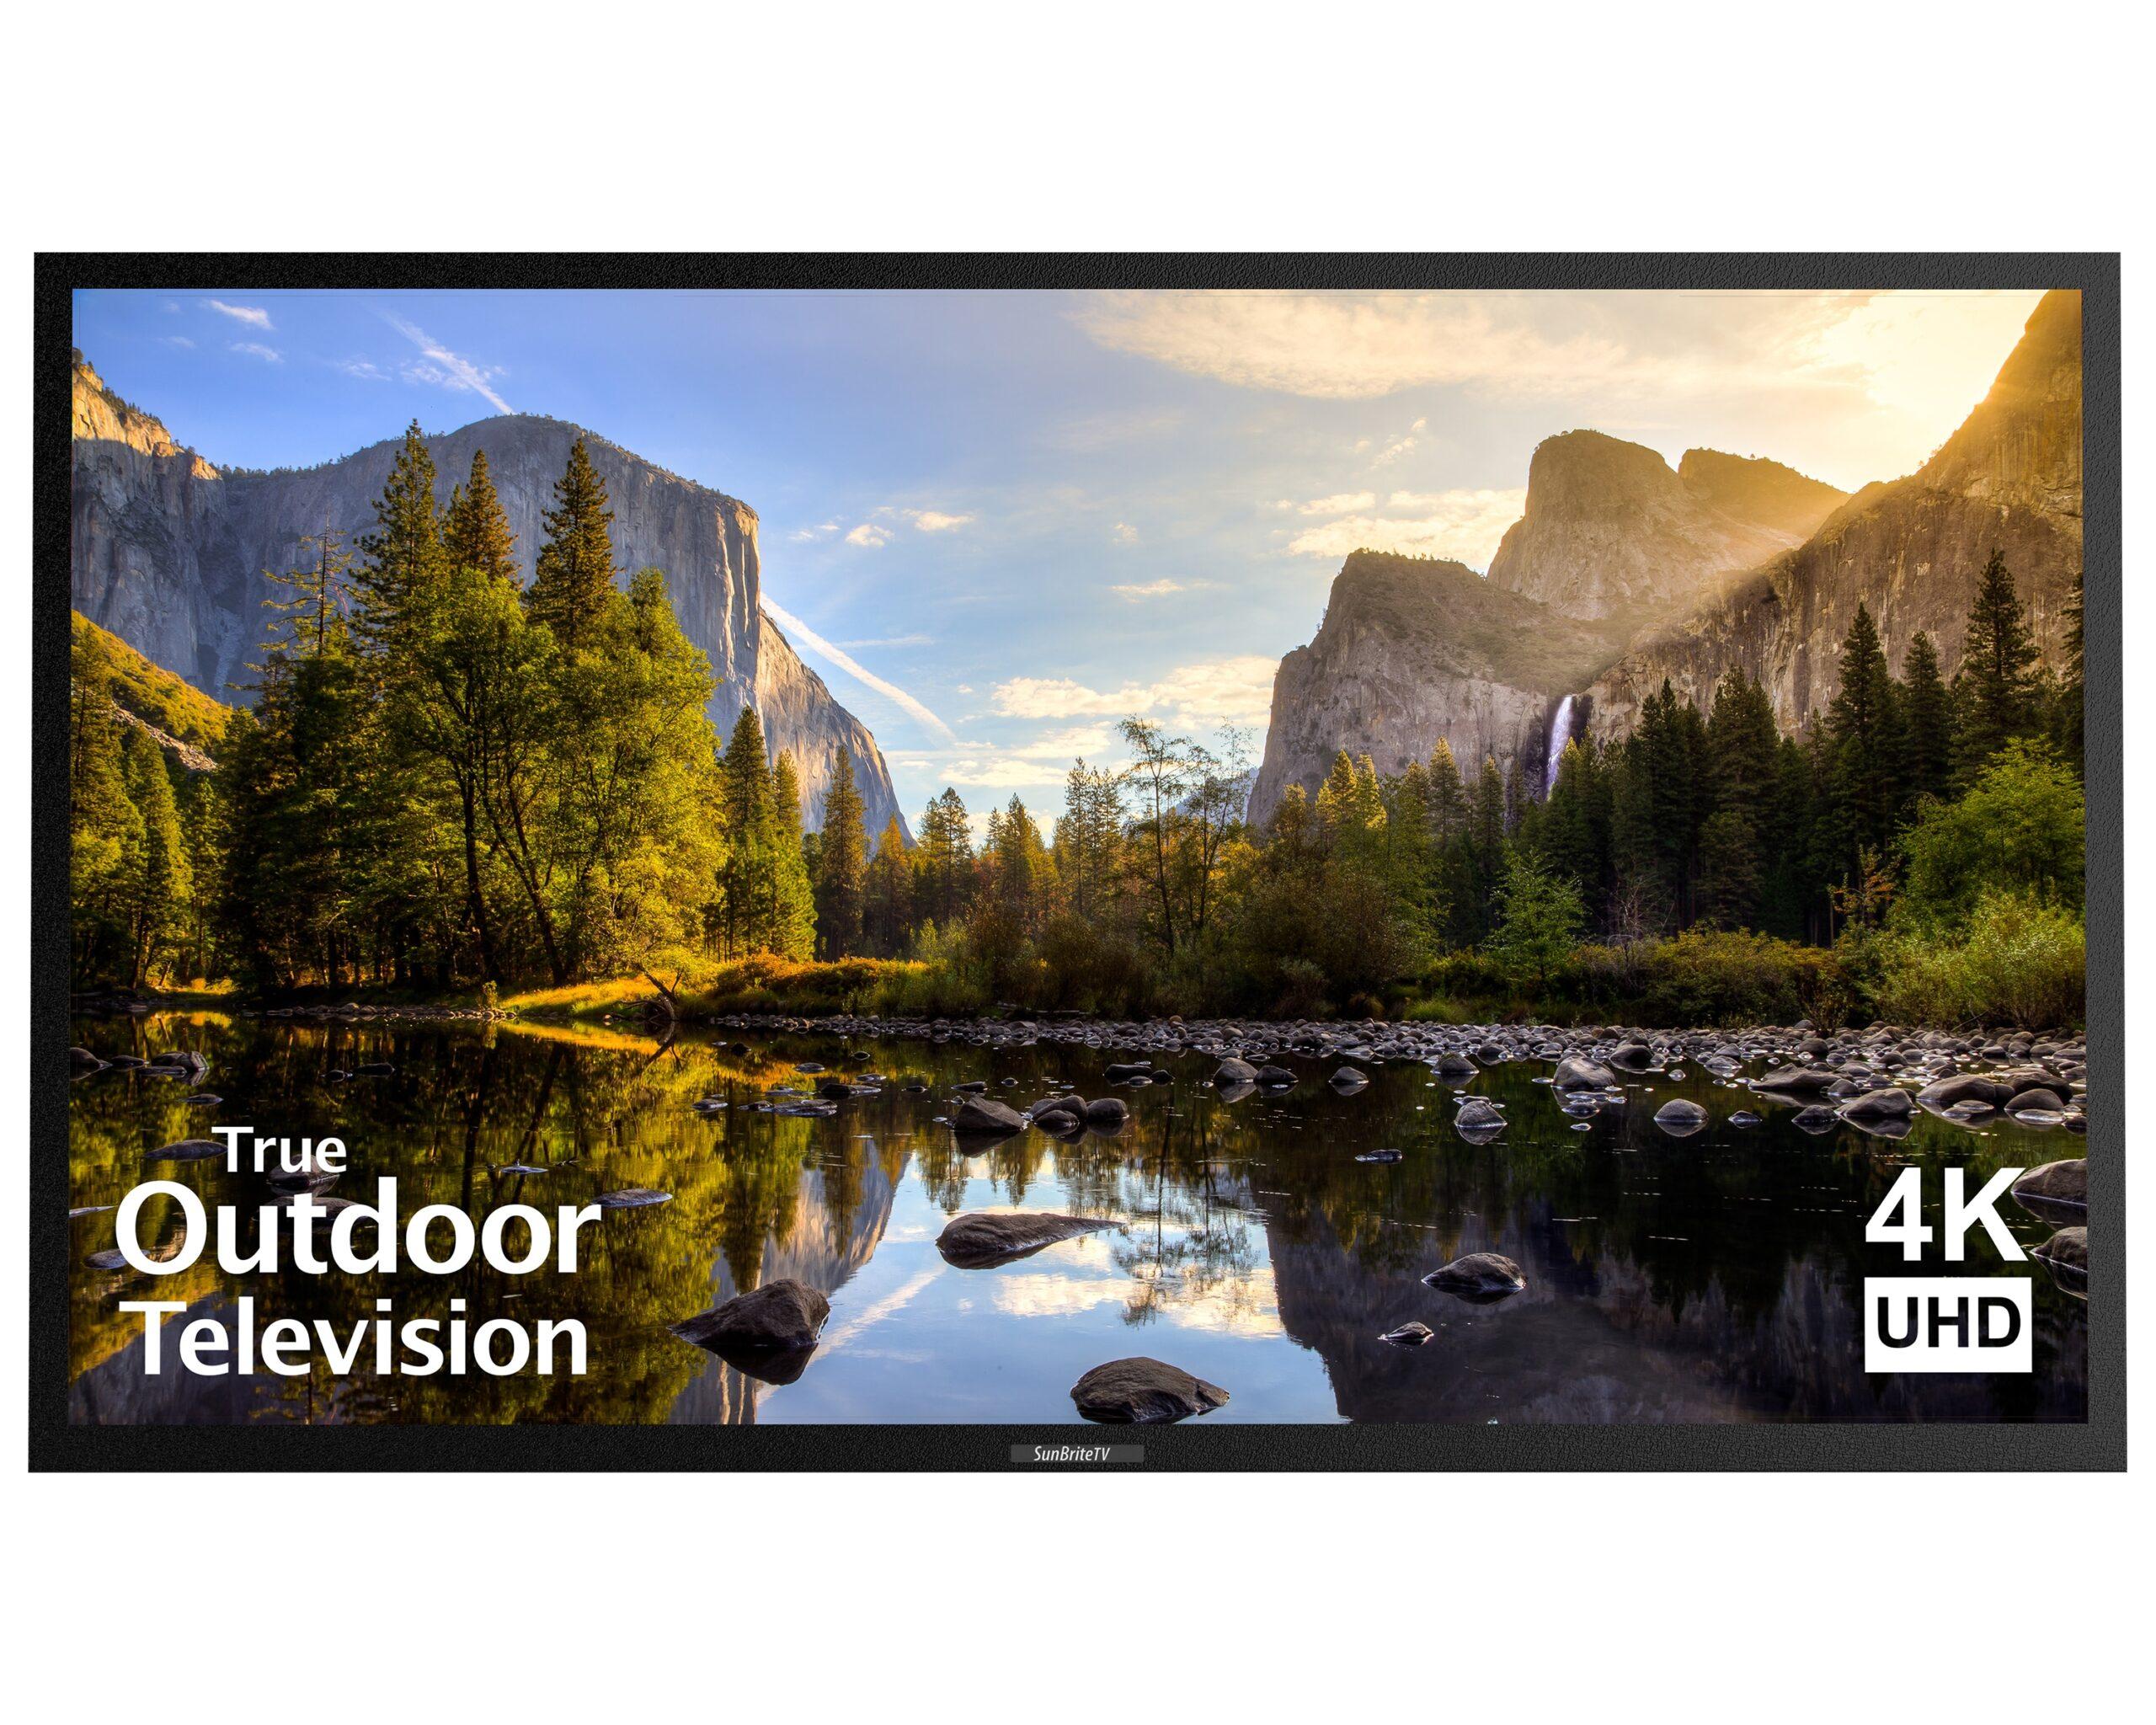 4K UHD HDR LED Outdoors TV SB-V-43-4KHDR-BL Black SunBriteTV 43-Inch Outdoor Television for Shade Veranda 2nd Gen